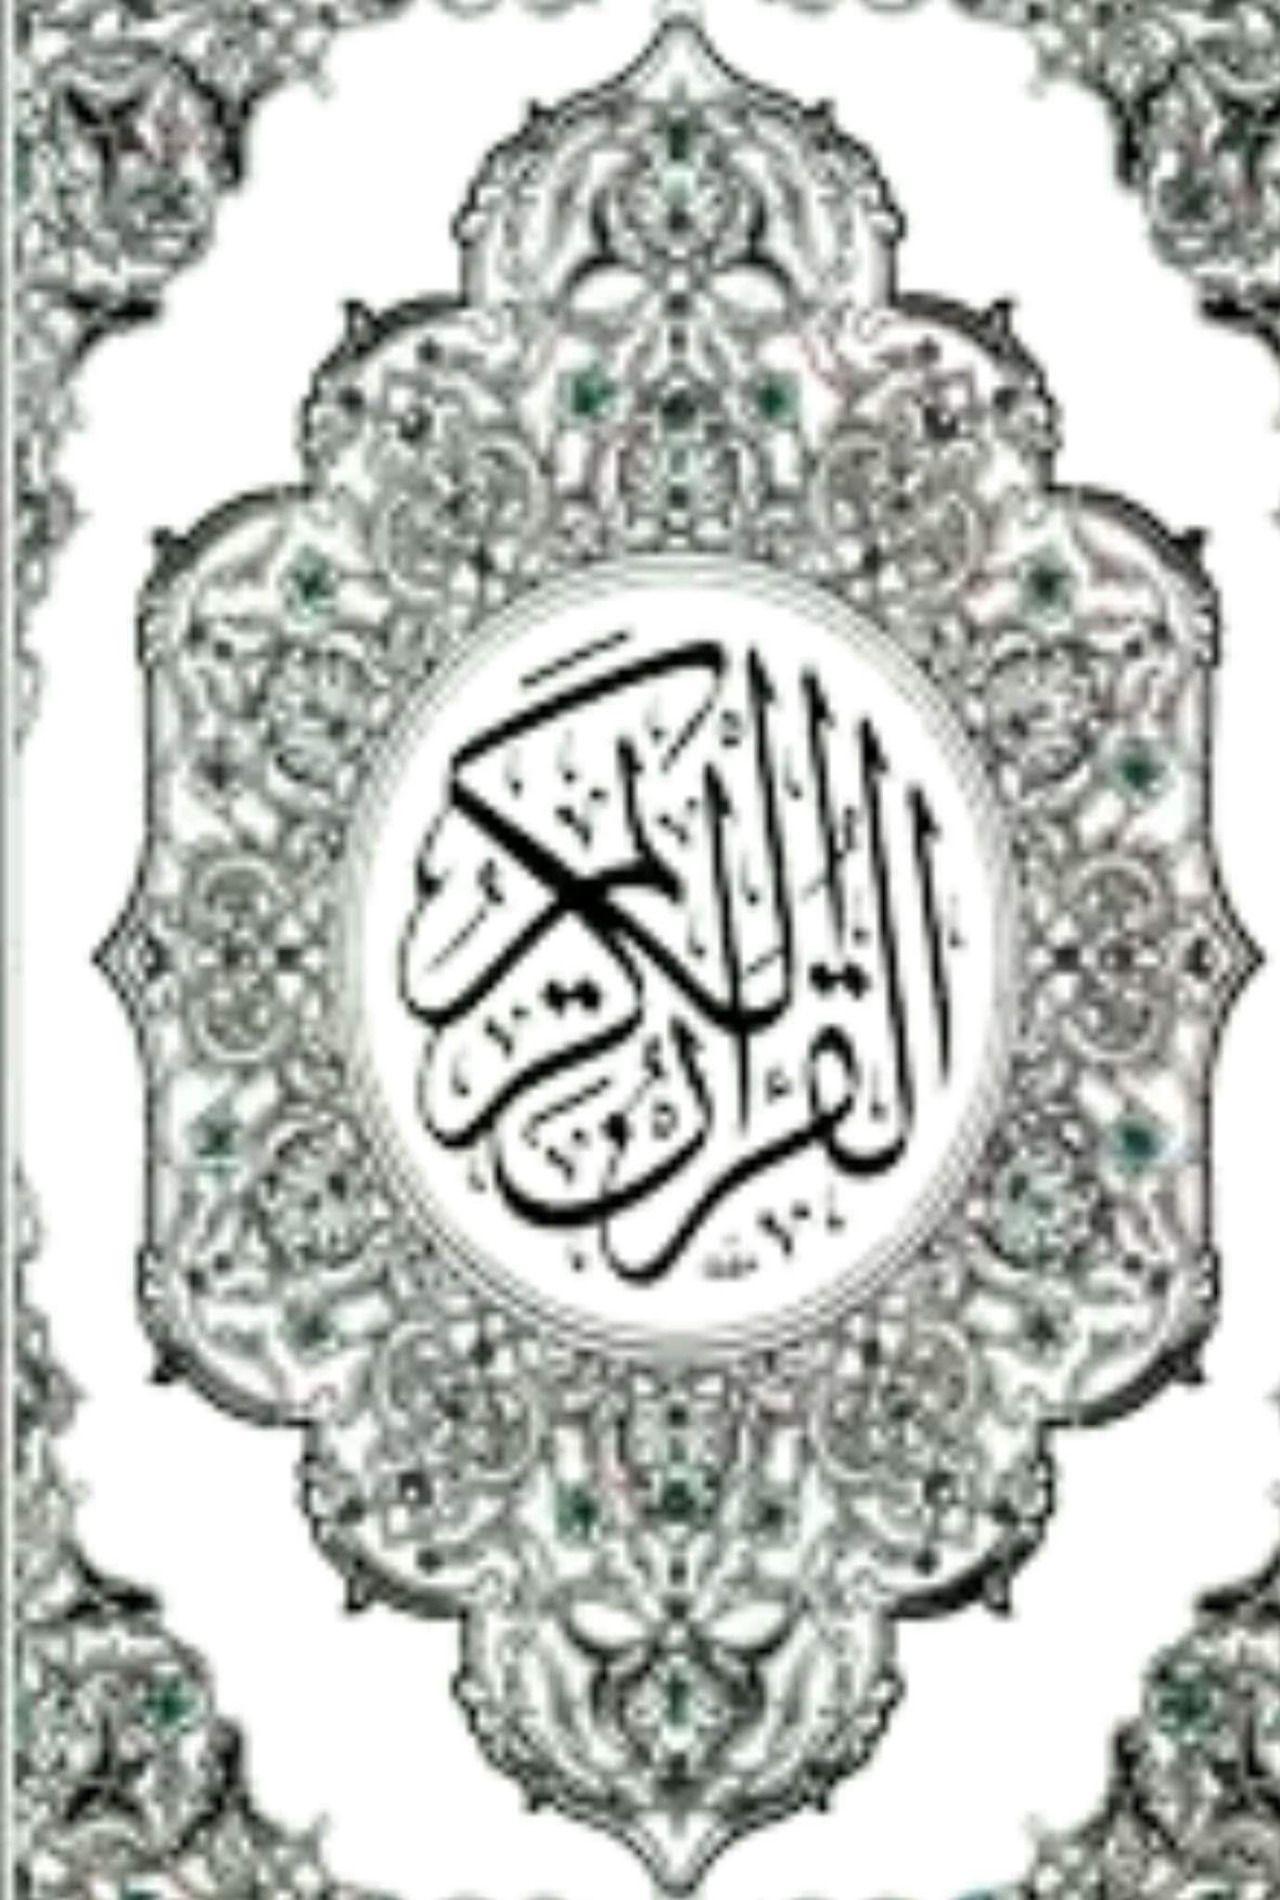 مصحف المدينة بي دي اف Pdf Http Www Islamicbook Ws Quranpdf Quran Zip Decorative Plates Decor Peace Symbol